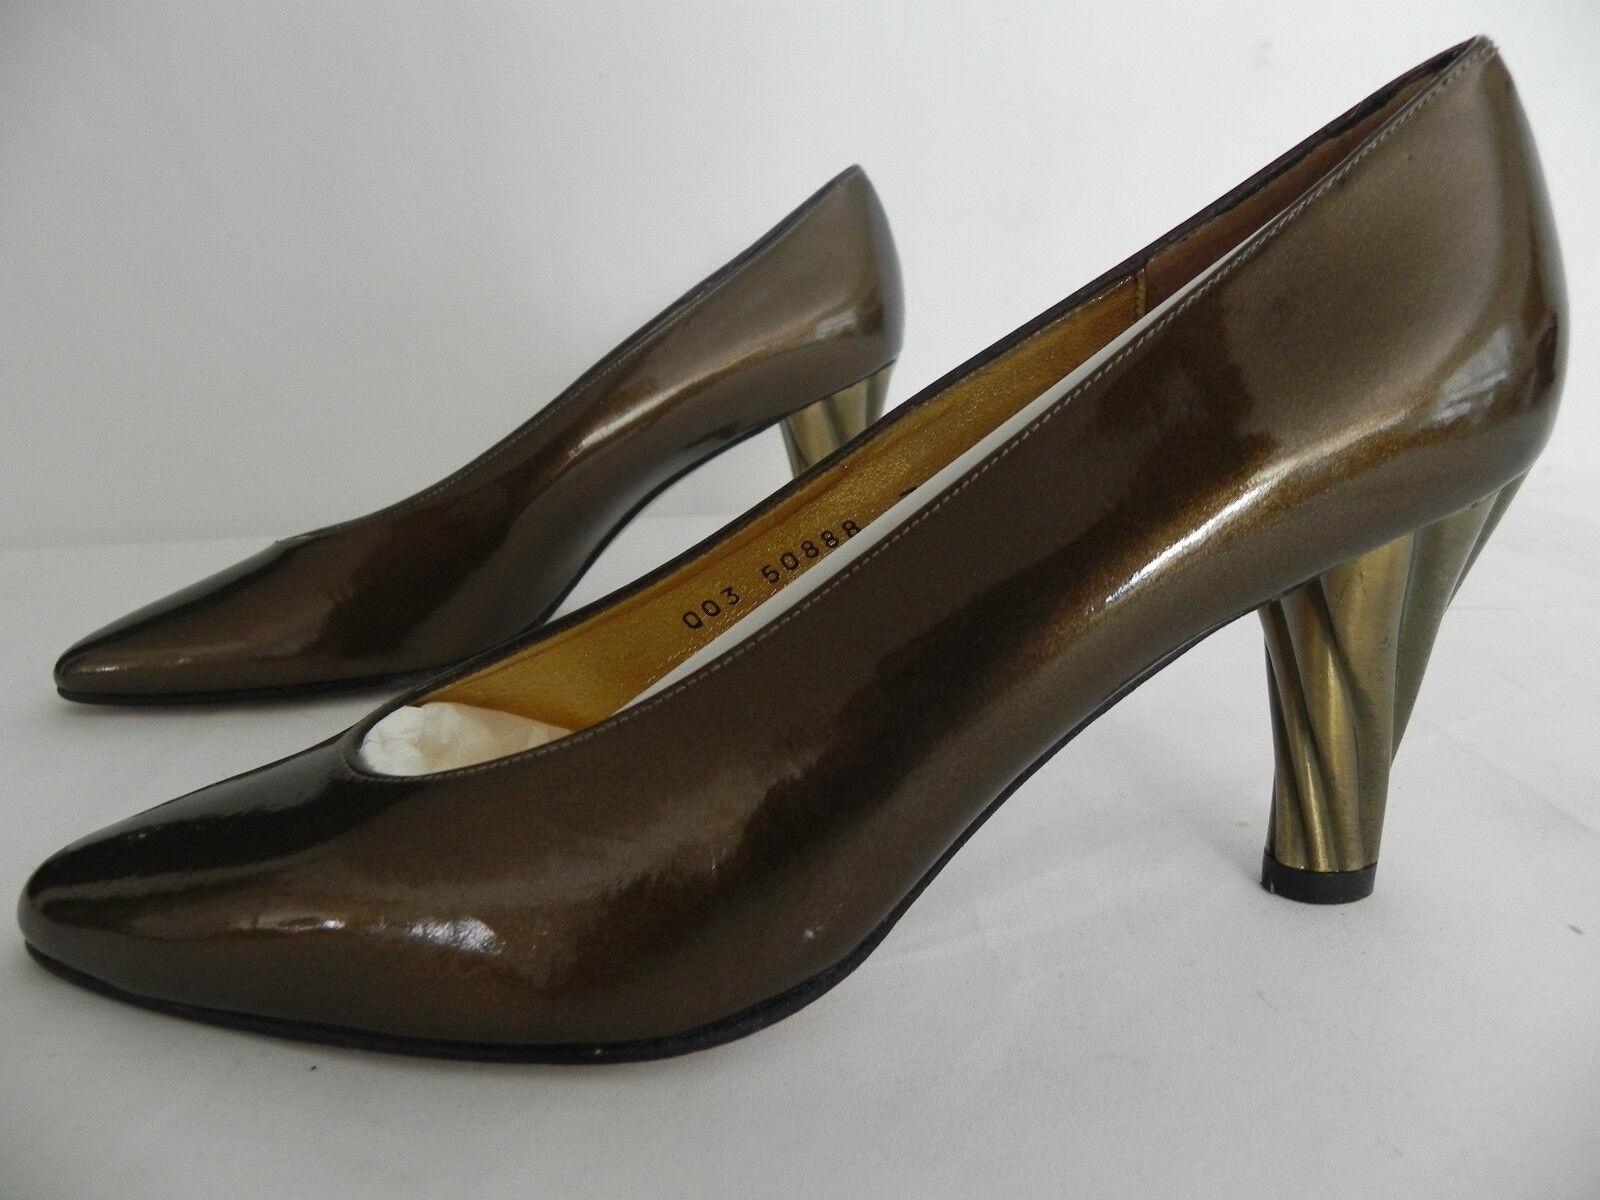 New Timothy Hitsman Heels  Pumps   US 7M   Metallic Bronze   Leather